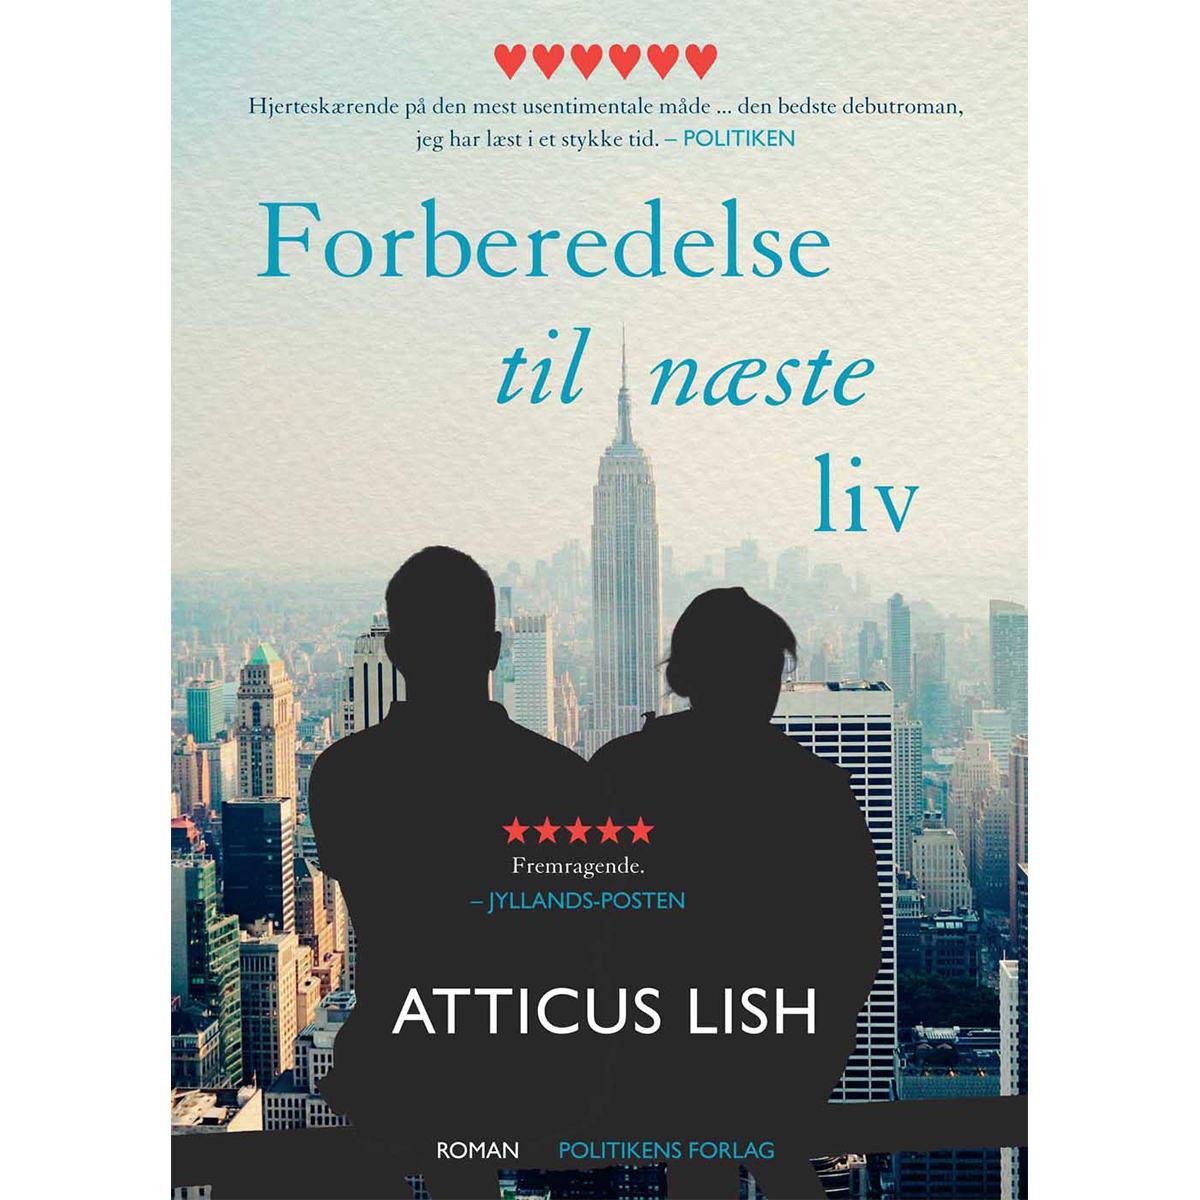 Af Atticus Lish